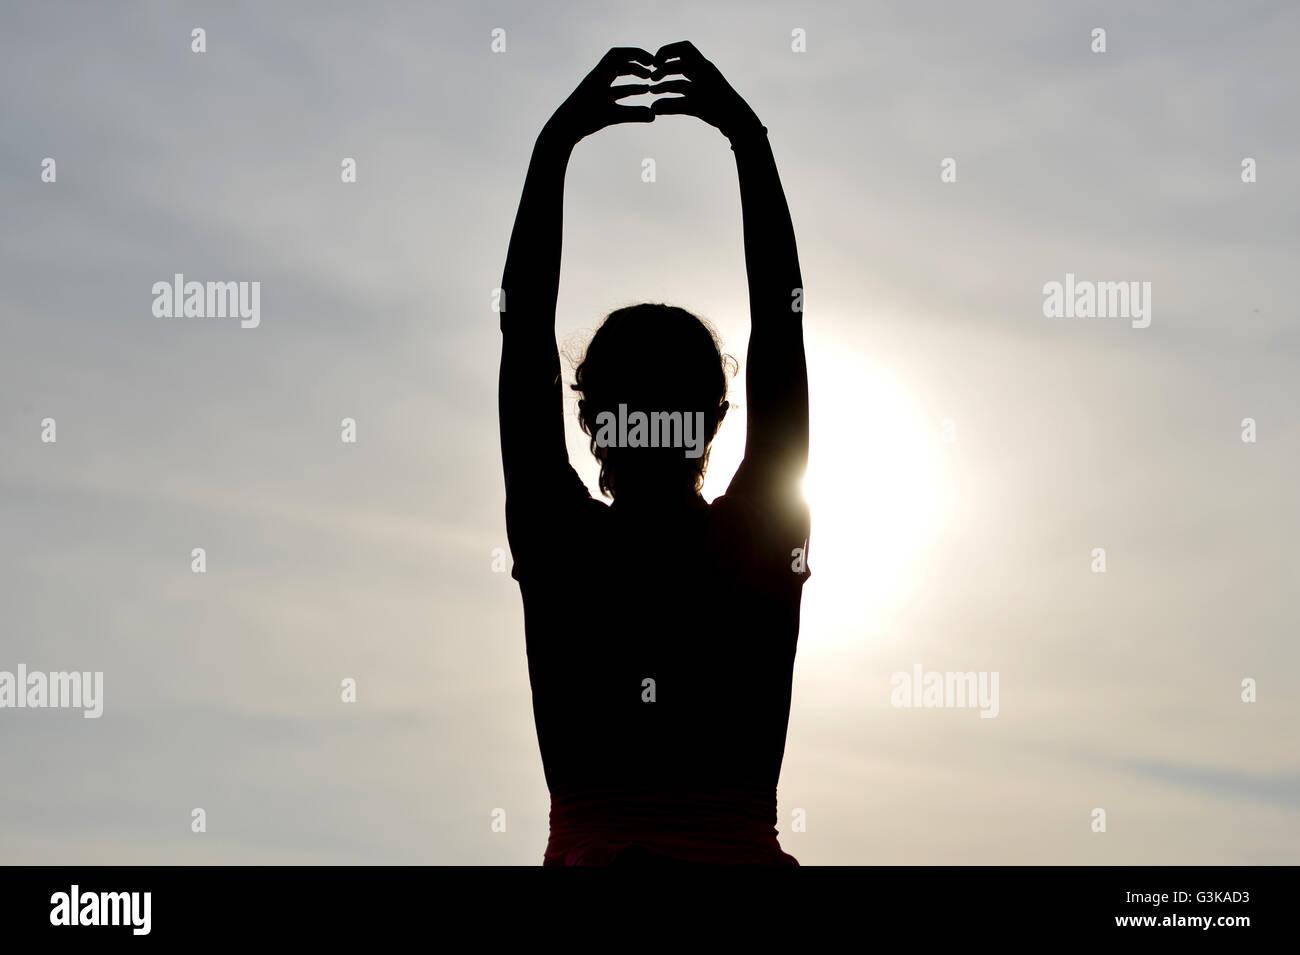 Silhouette of girl exercising outside - Stock Image